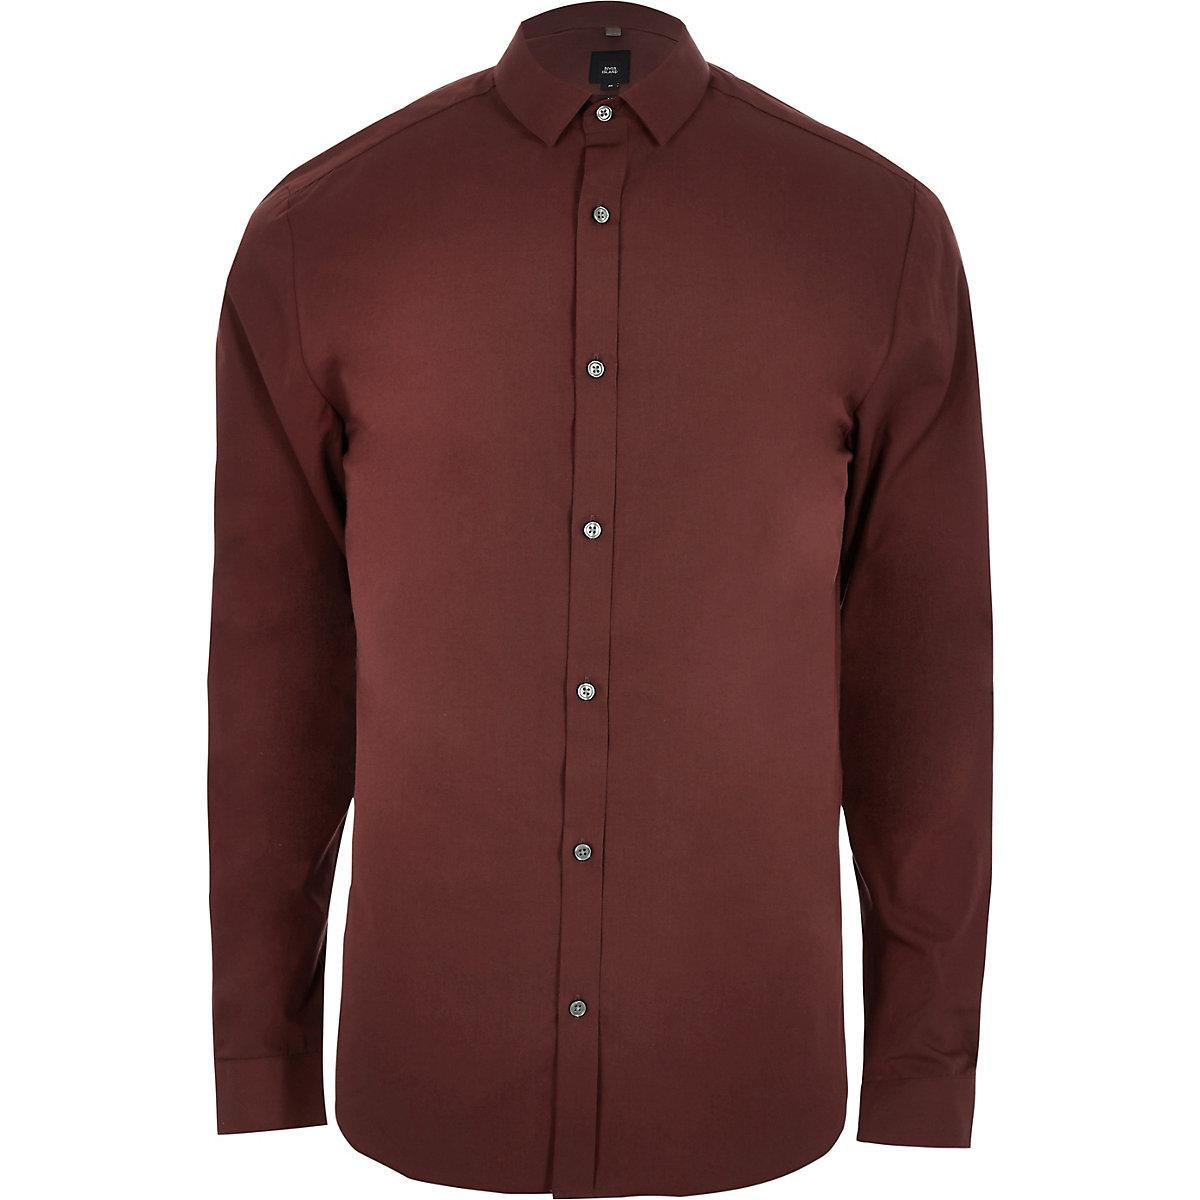 Rust brown long sleeve shirt